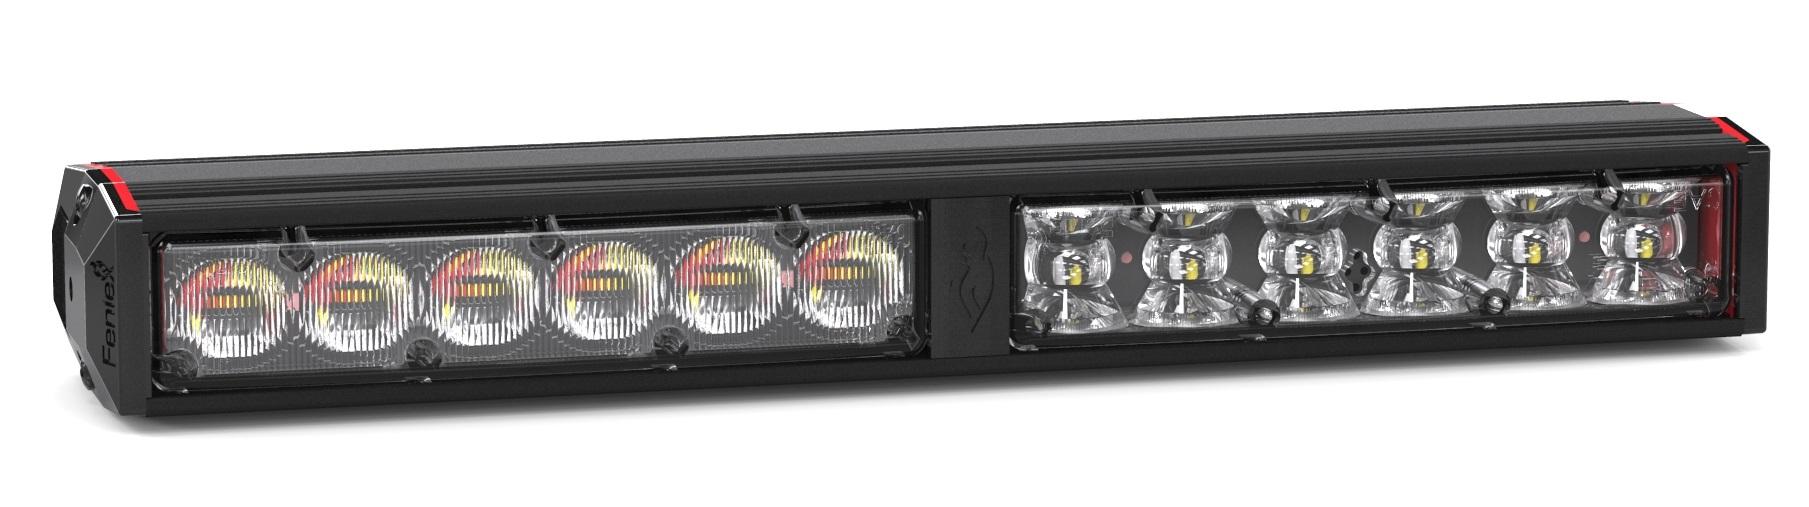 feniex-fusion-200-lightstick-1crop.jpg